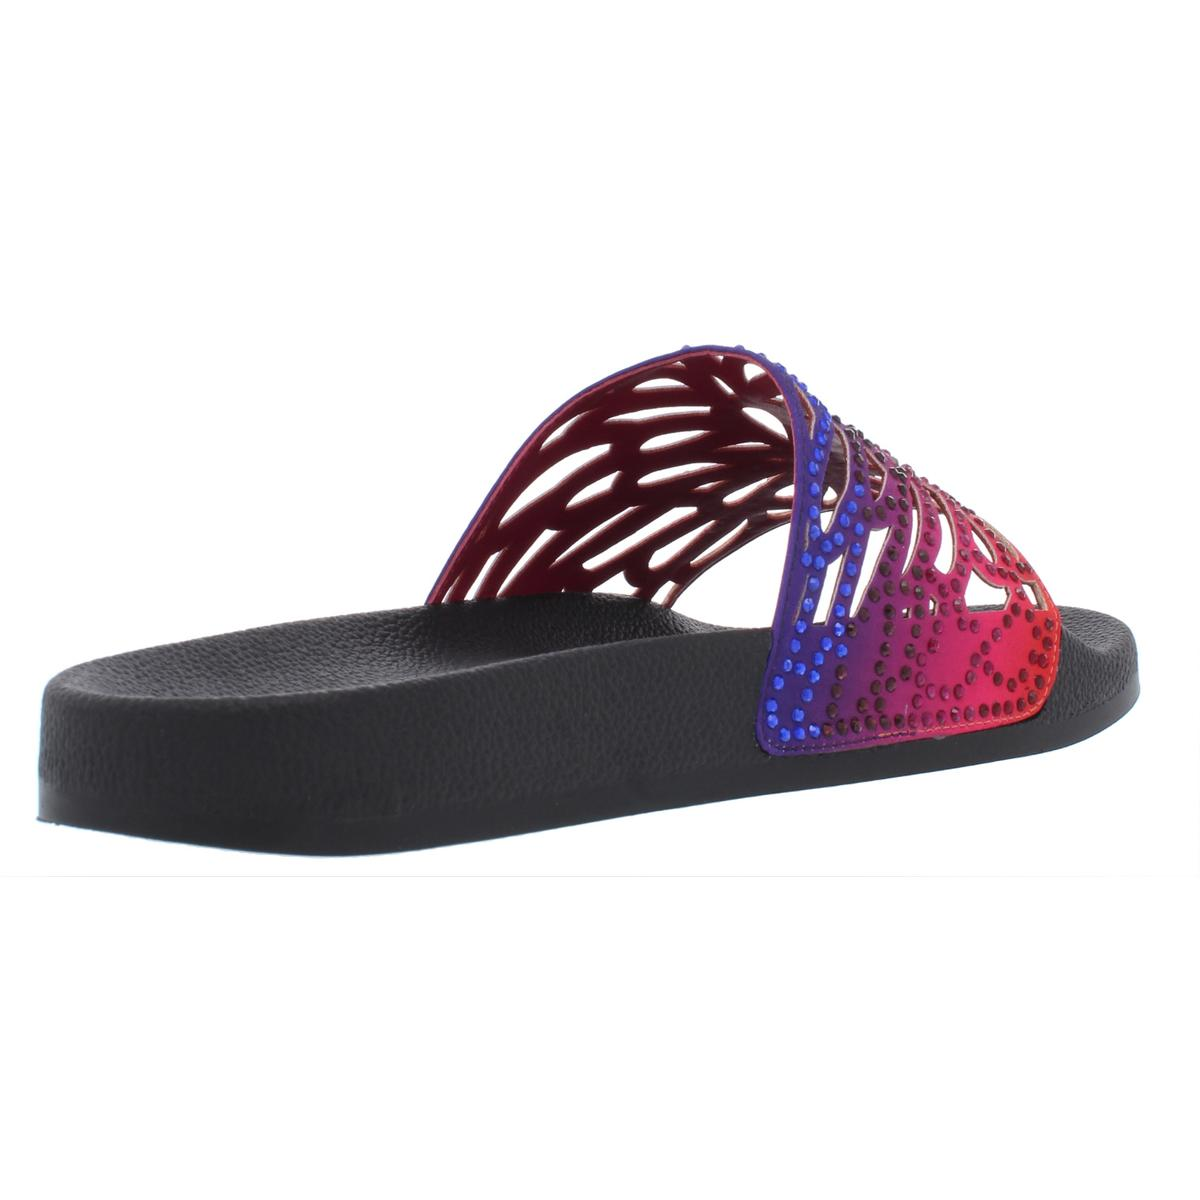 INC Womens Peymin22 Satin Pool Embellished Slide Sandals Flats BHFO 6450